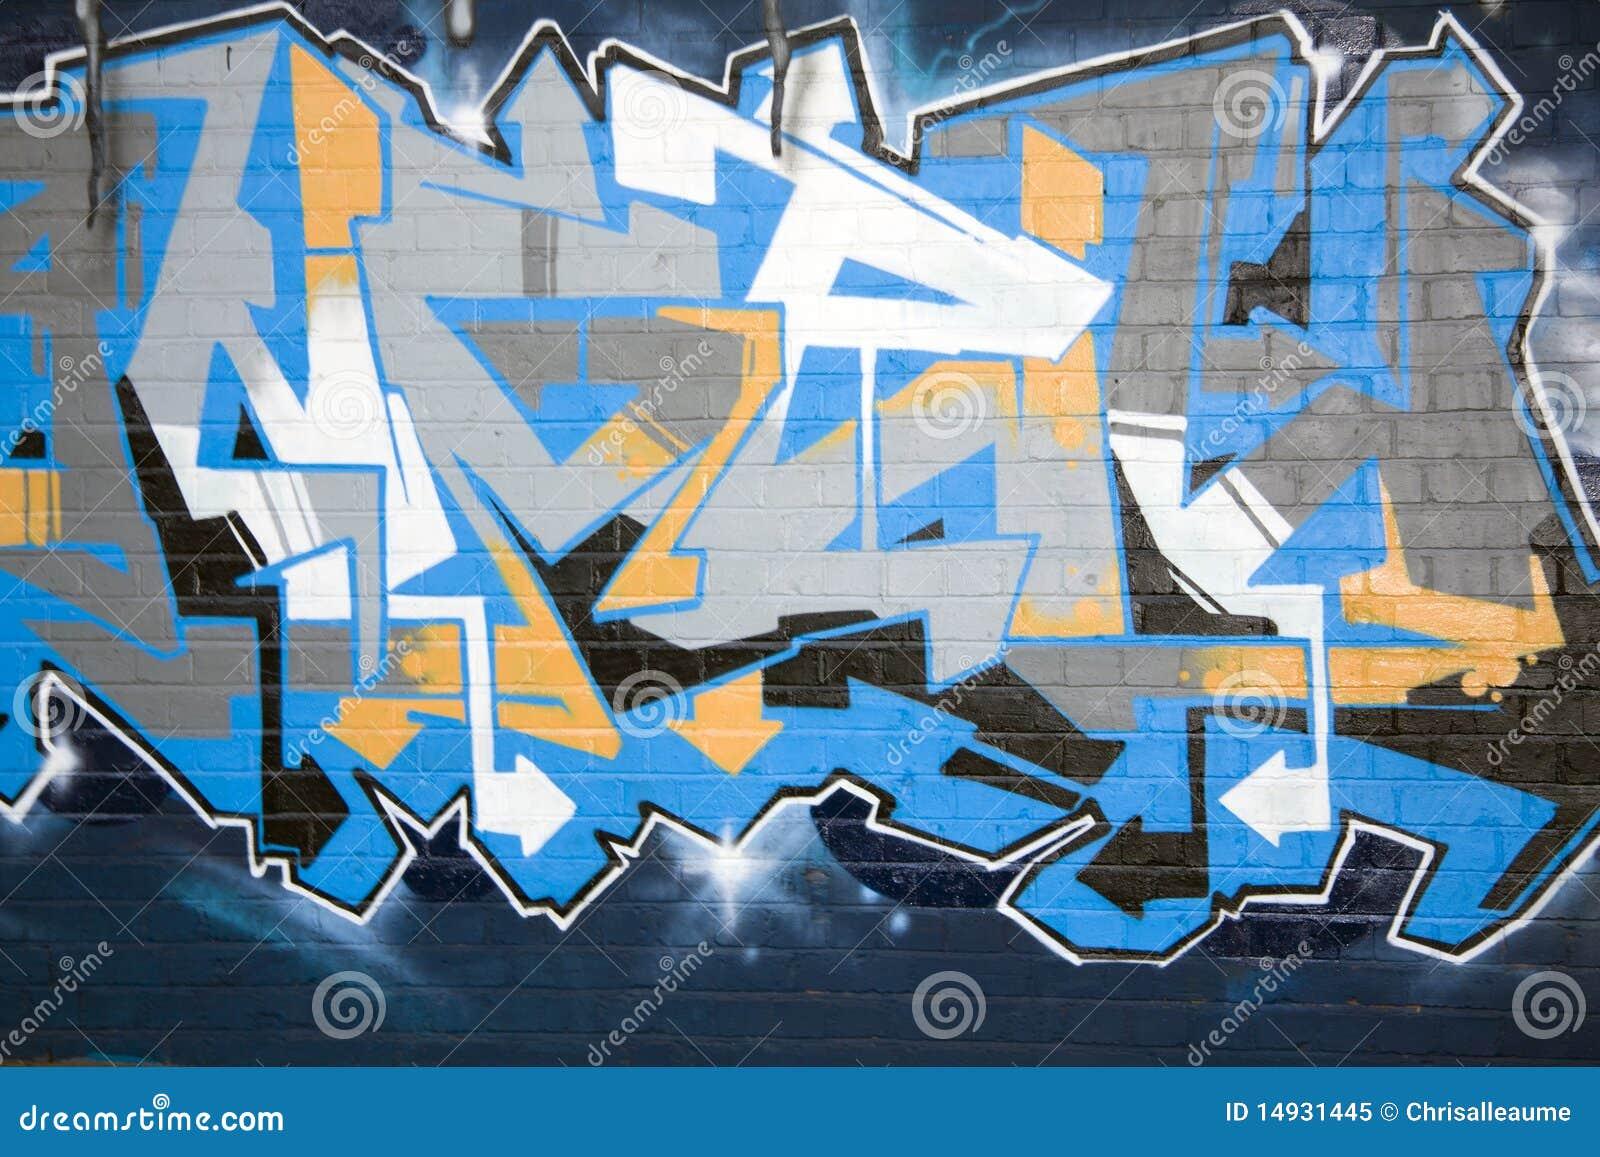 Graffiti on a wall, abstract